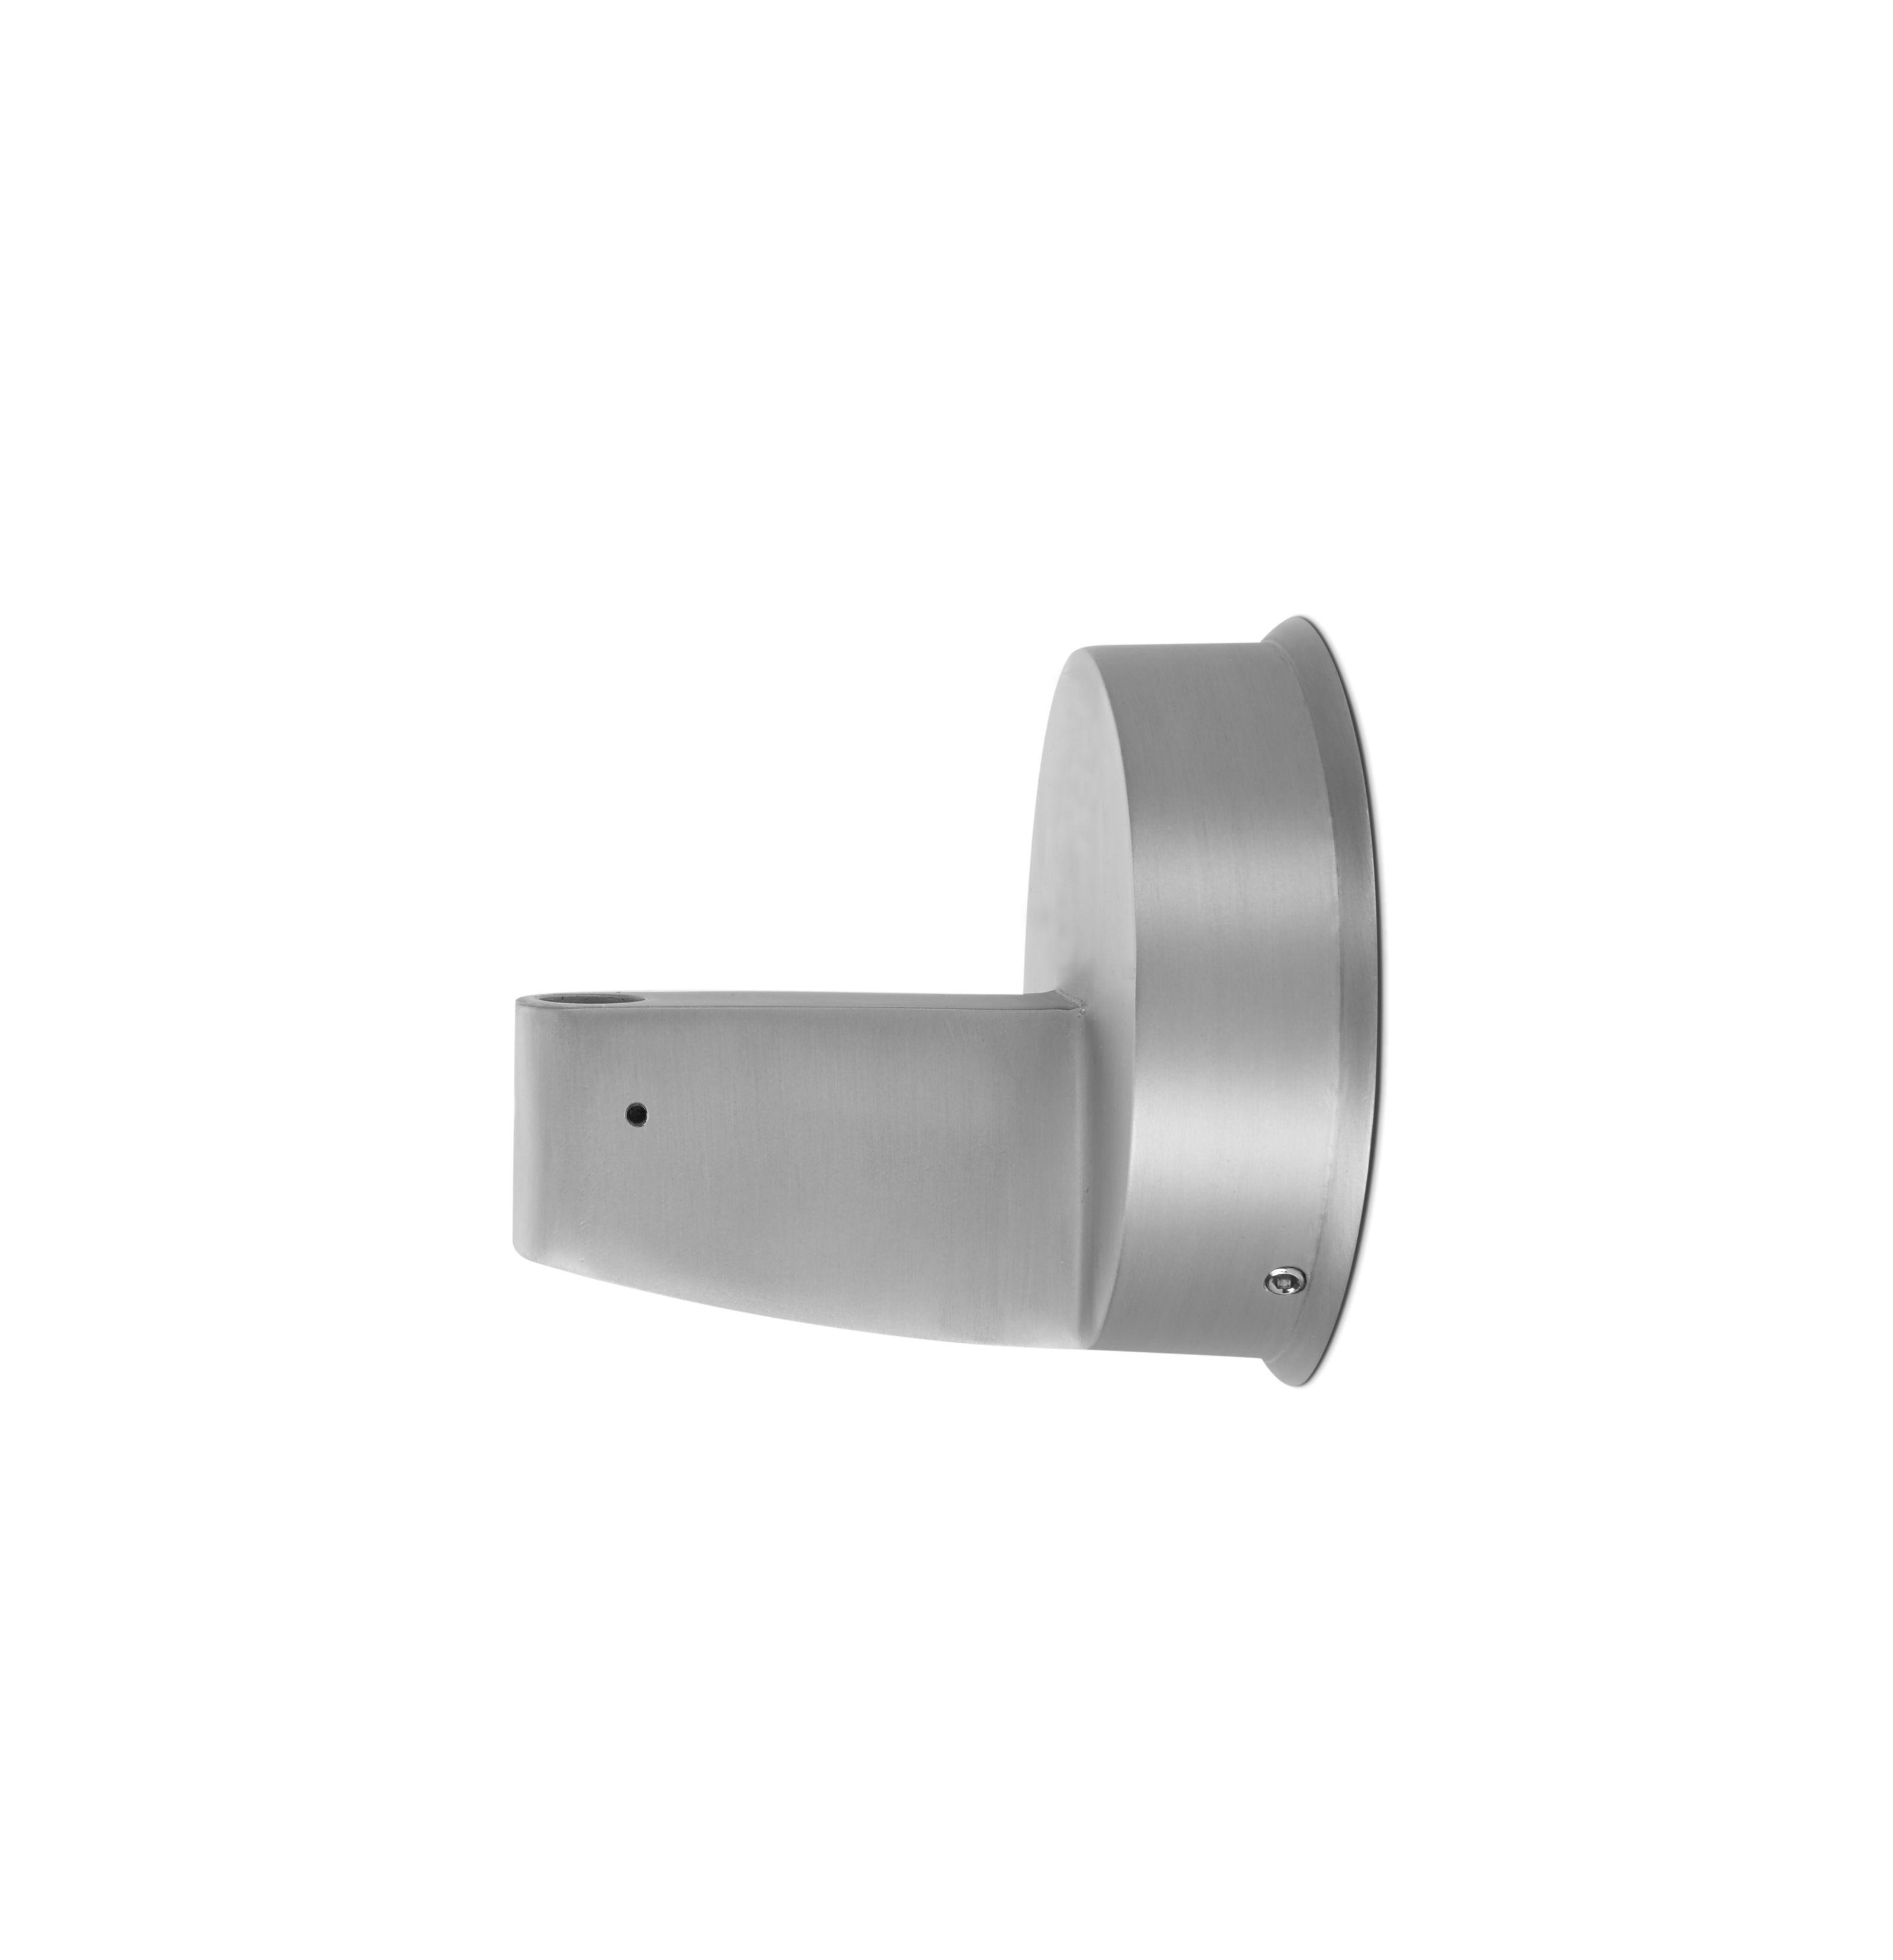 Luminaire - Appliques - Fixation murale / Pour lampes Anglepoise - Anglepoise - Chromé - Aluminium